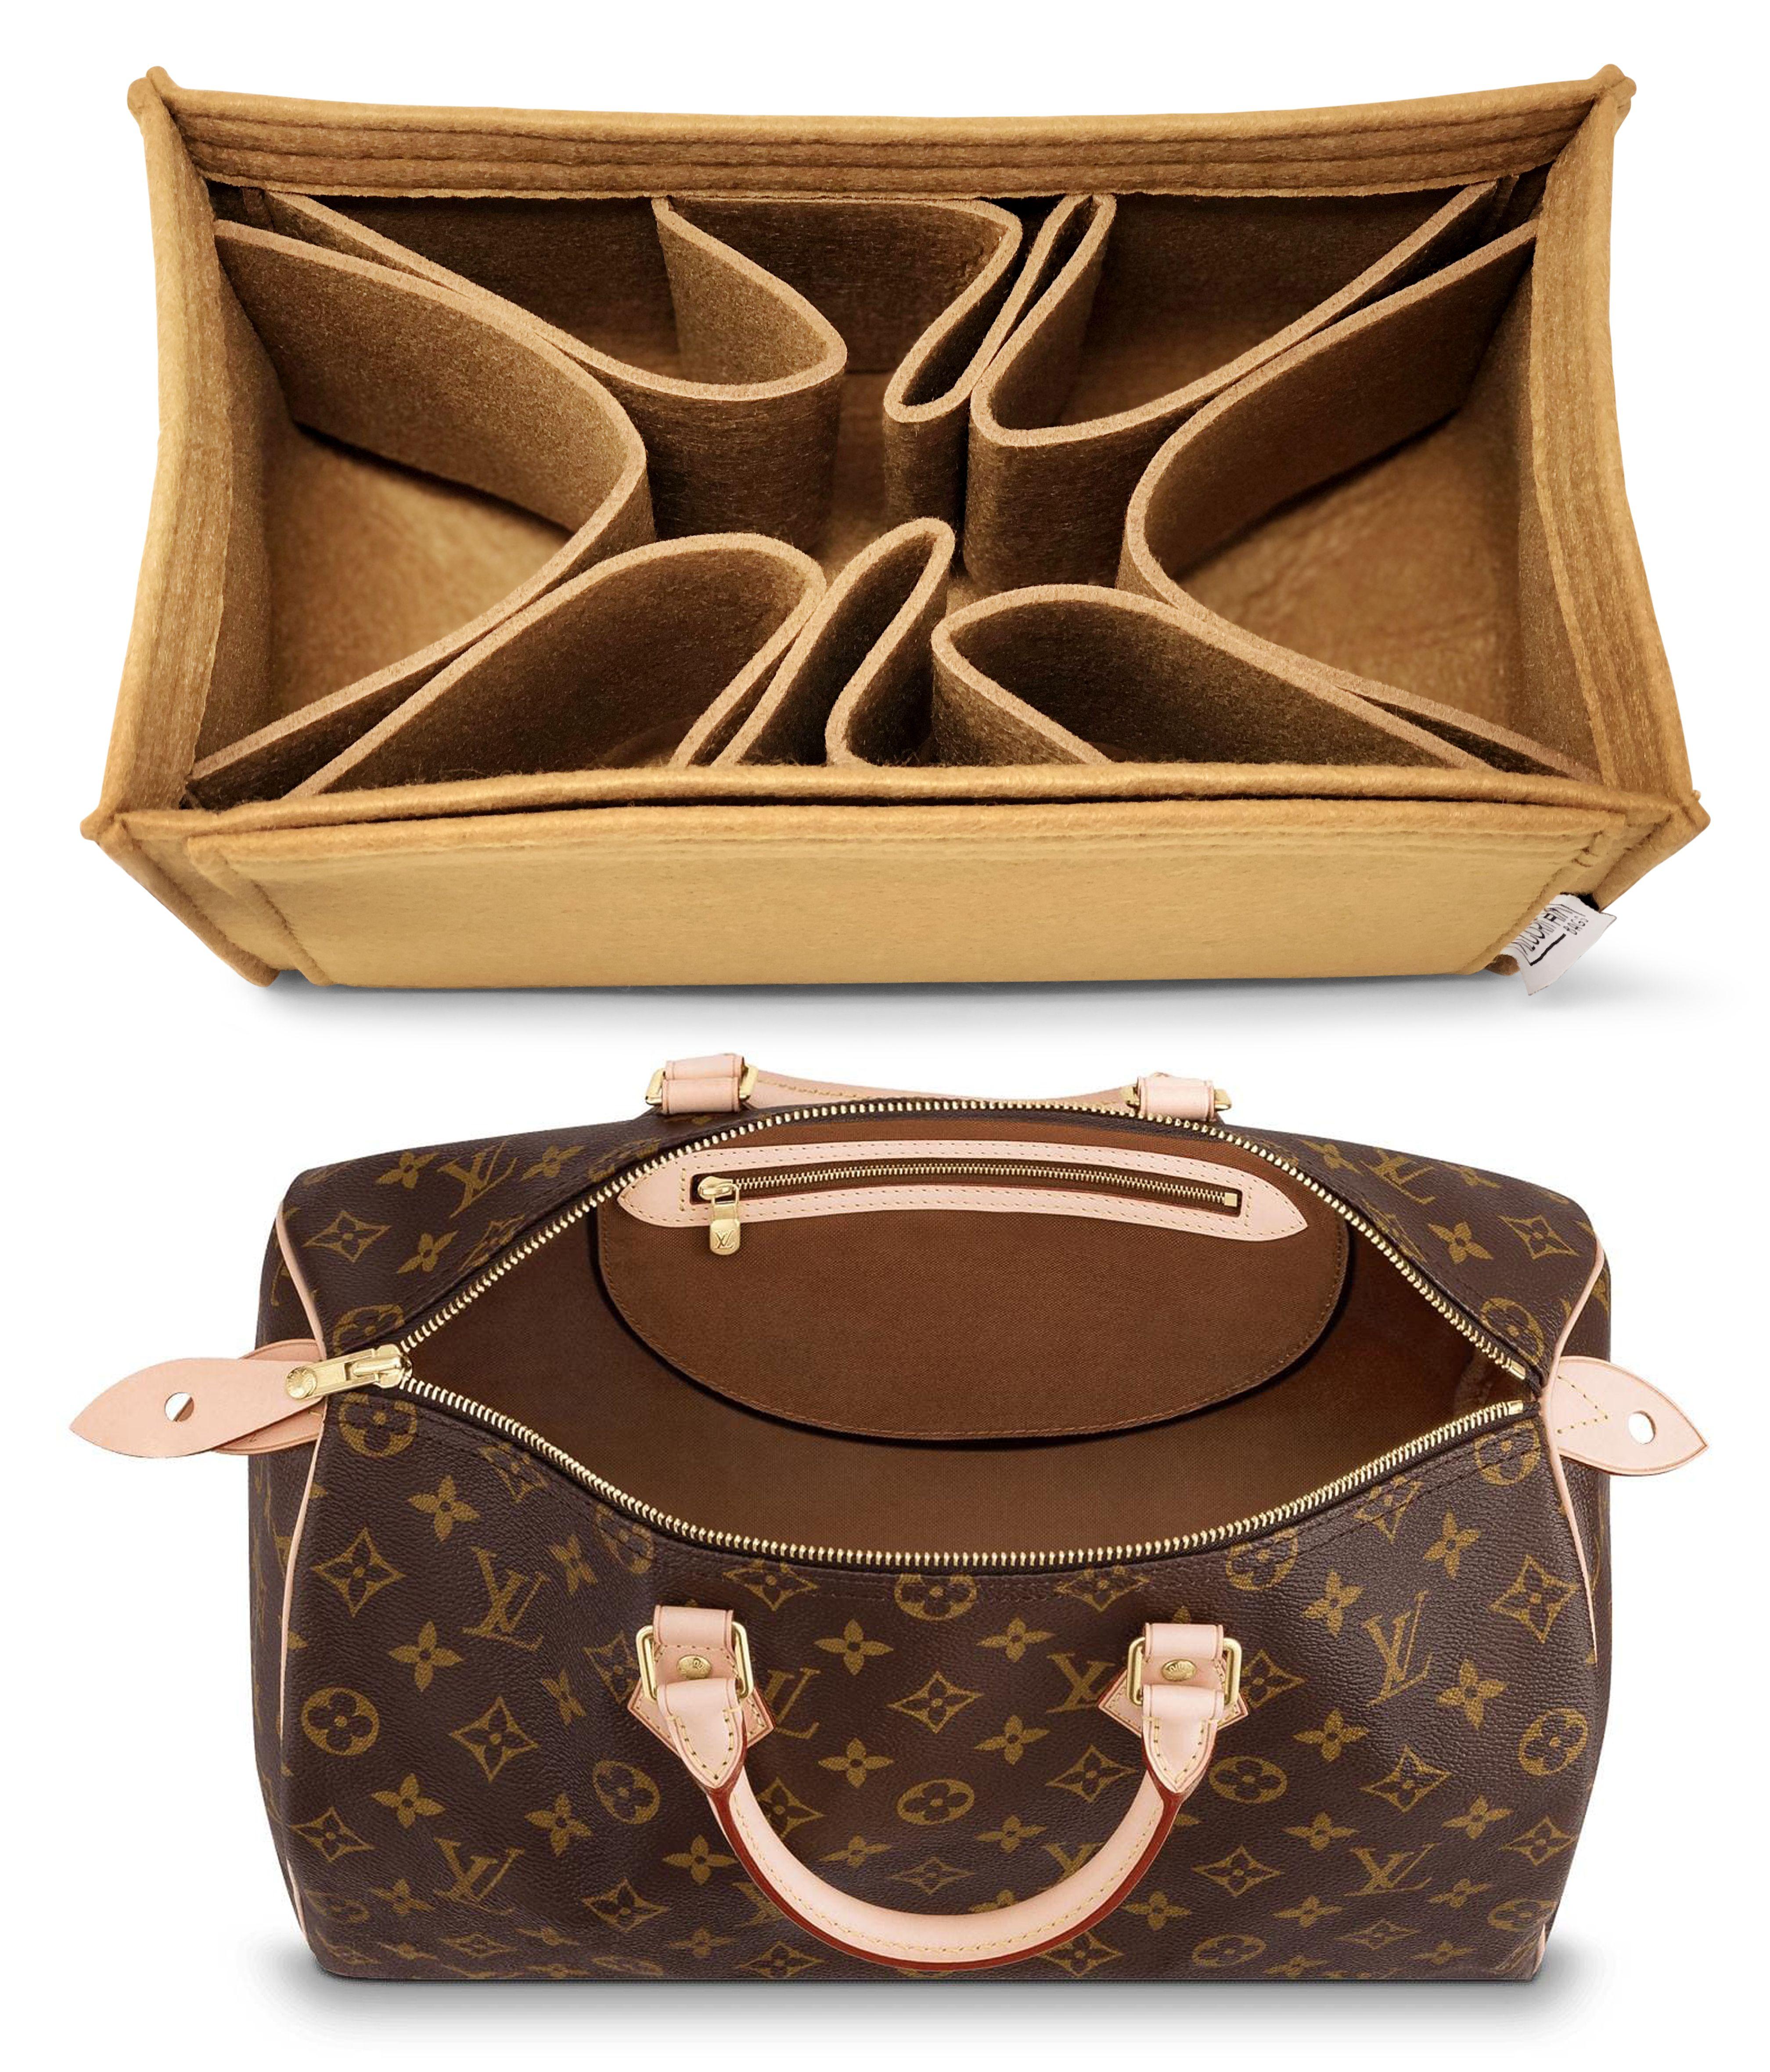 65a29eca9729d LV Purse Organizer for Louis Vuitton Speedy 35 Monogram Brown in ...